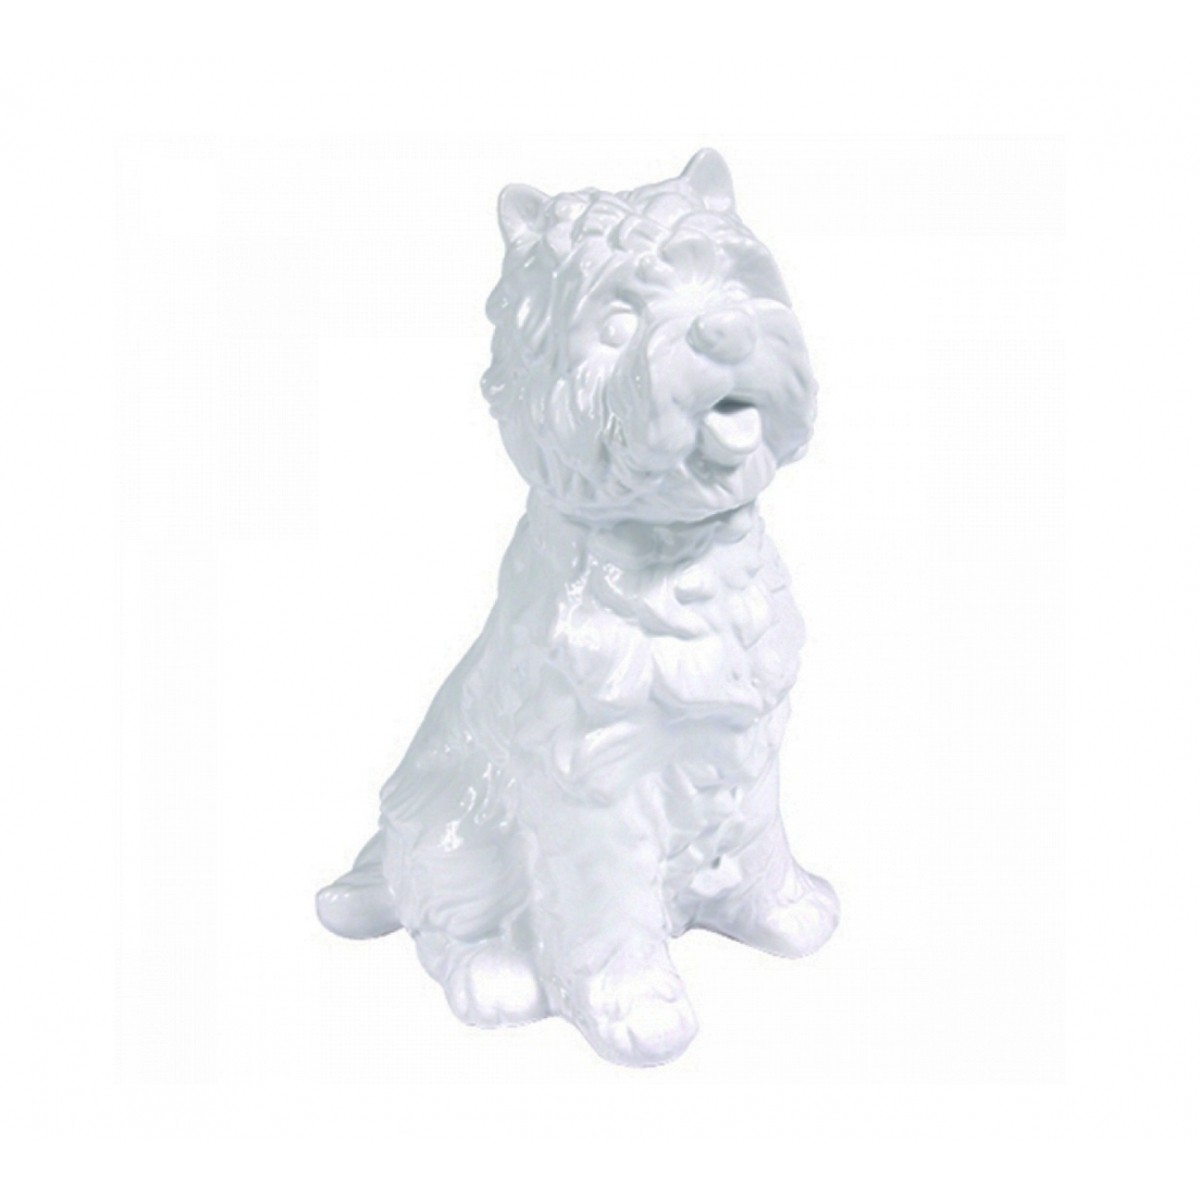 Cachorro Decorativo de Cerâmica - Branco M  - N Store